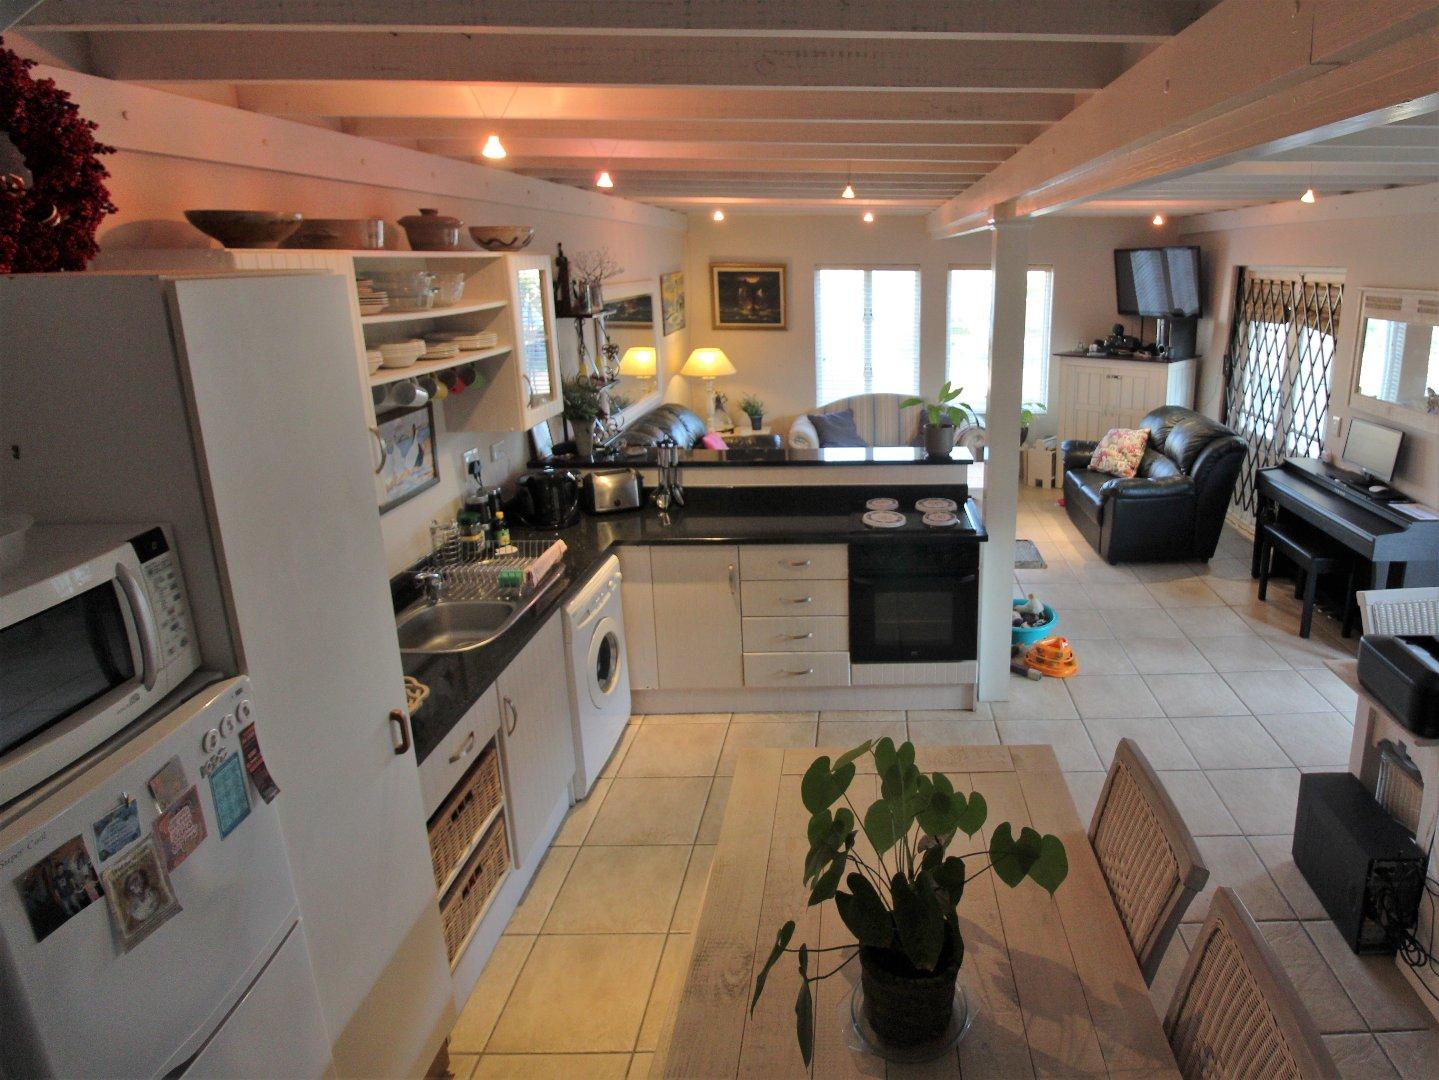 Plettenberg Bay, Keurboomstrand Property  | Houses For Sale Keurboomstrand (Garden Route), Keurboomstrand, Townhouse 2 bedrooms property for sale Price:1,495,000